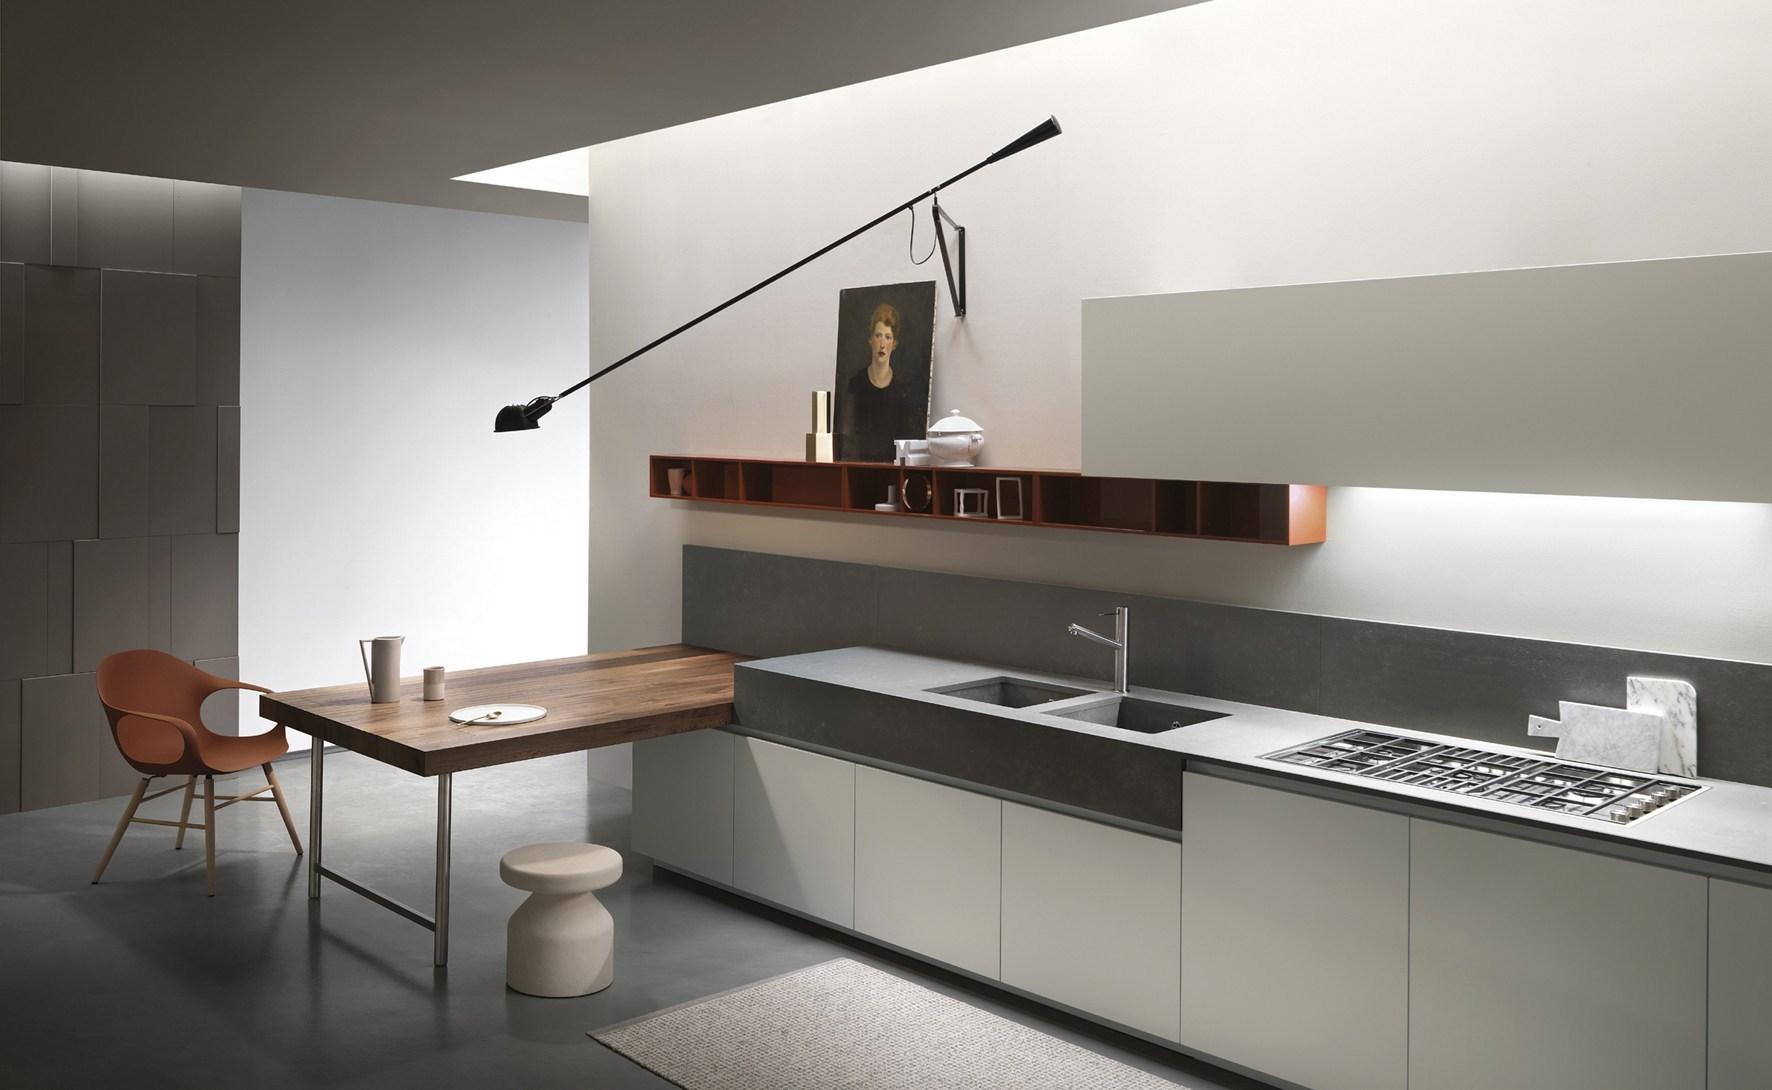 Archi S Kitchen